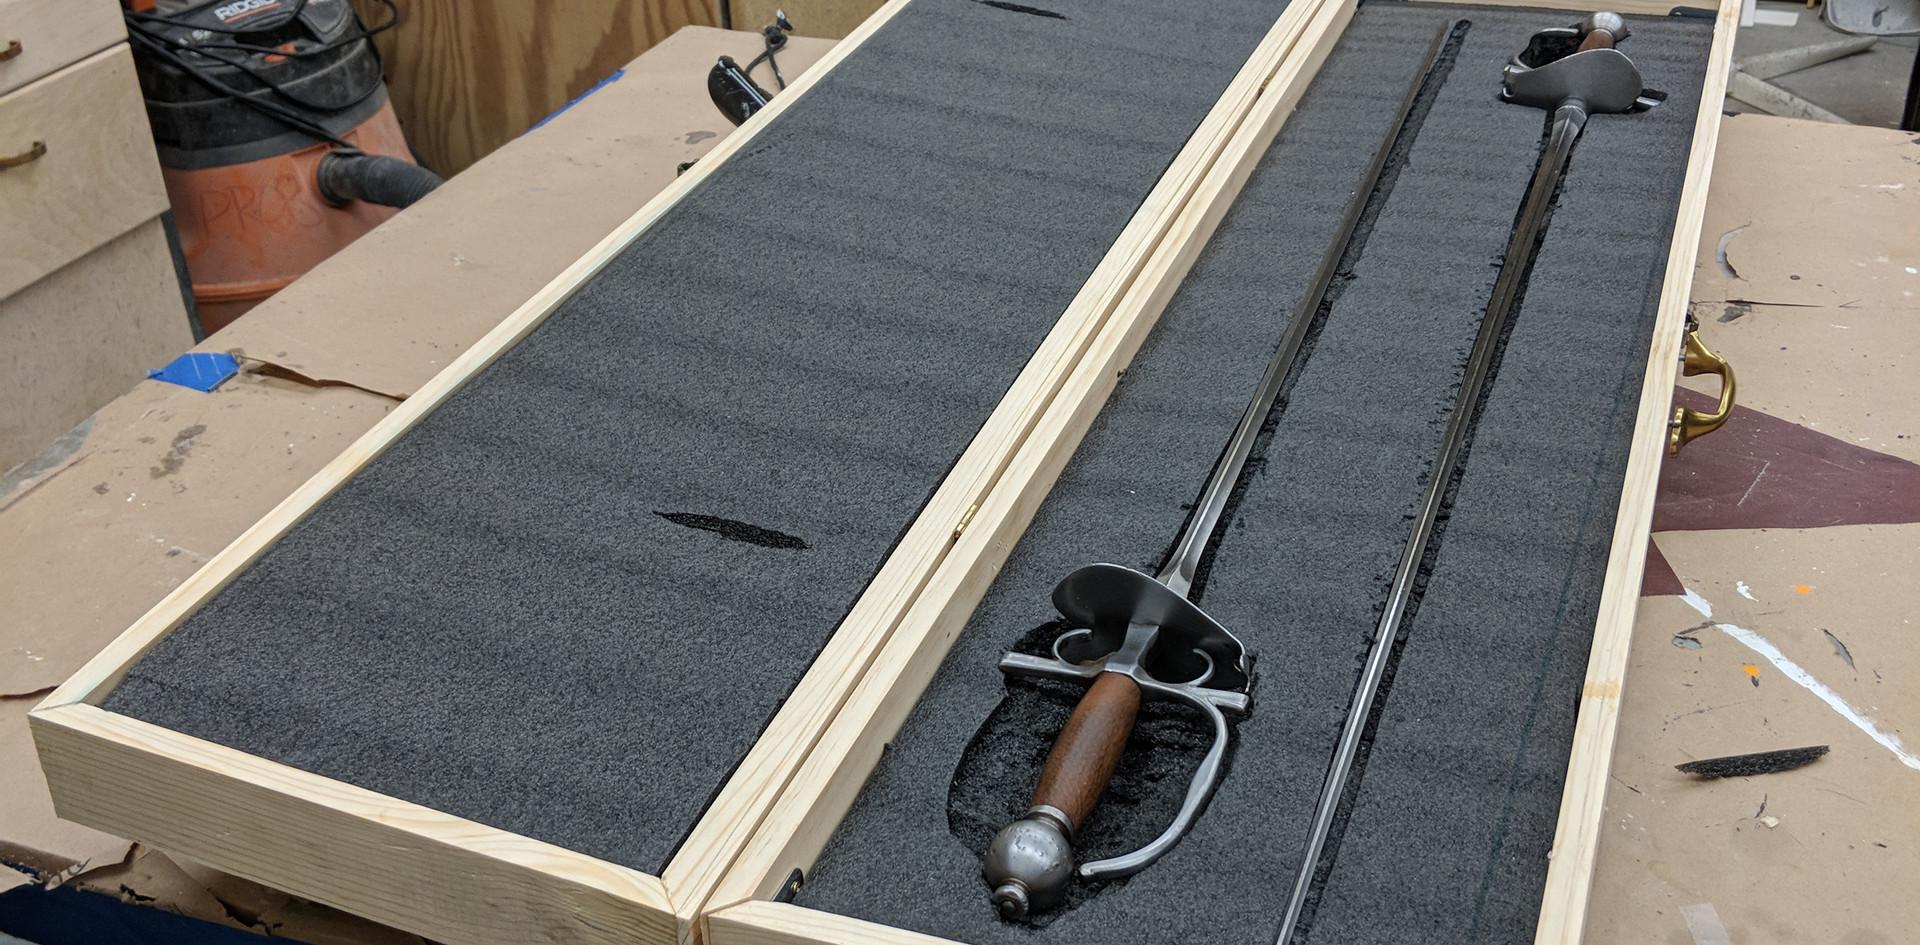 Sword Case: Progress